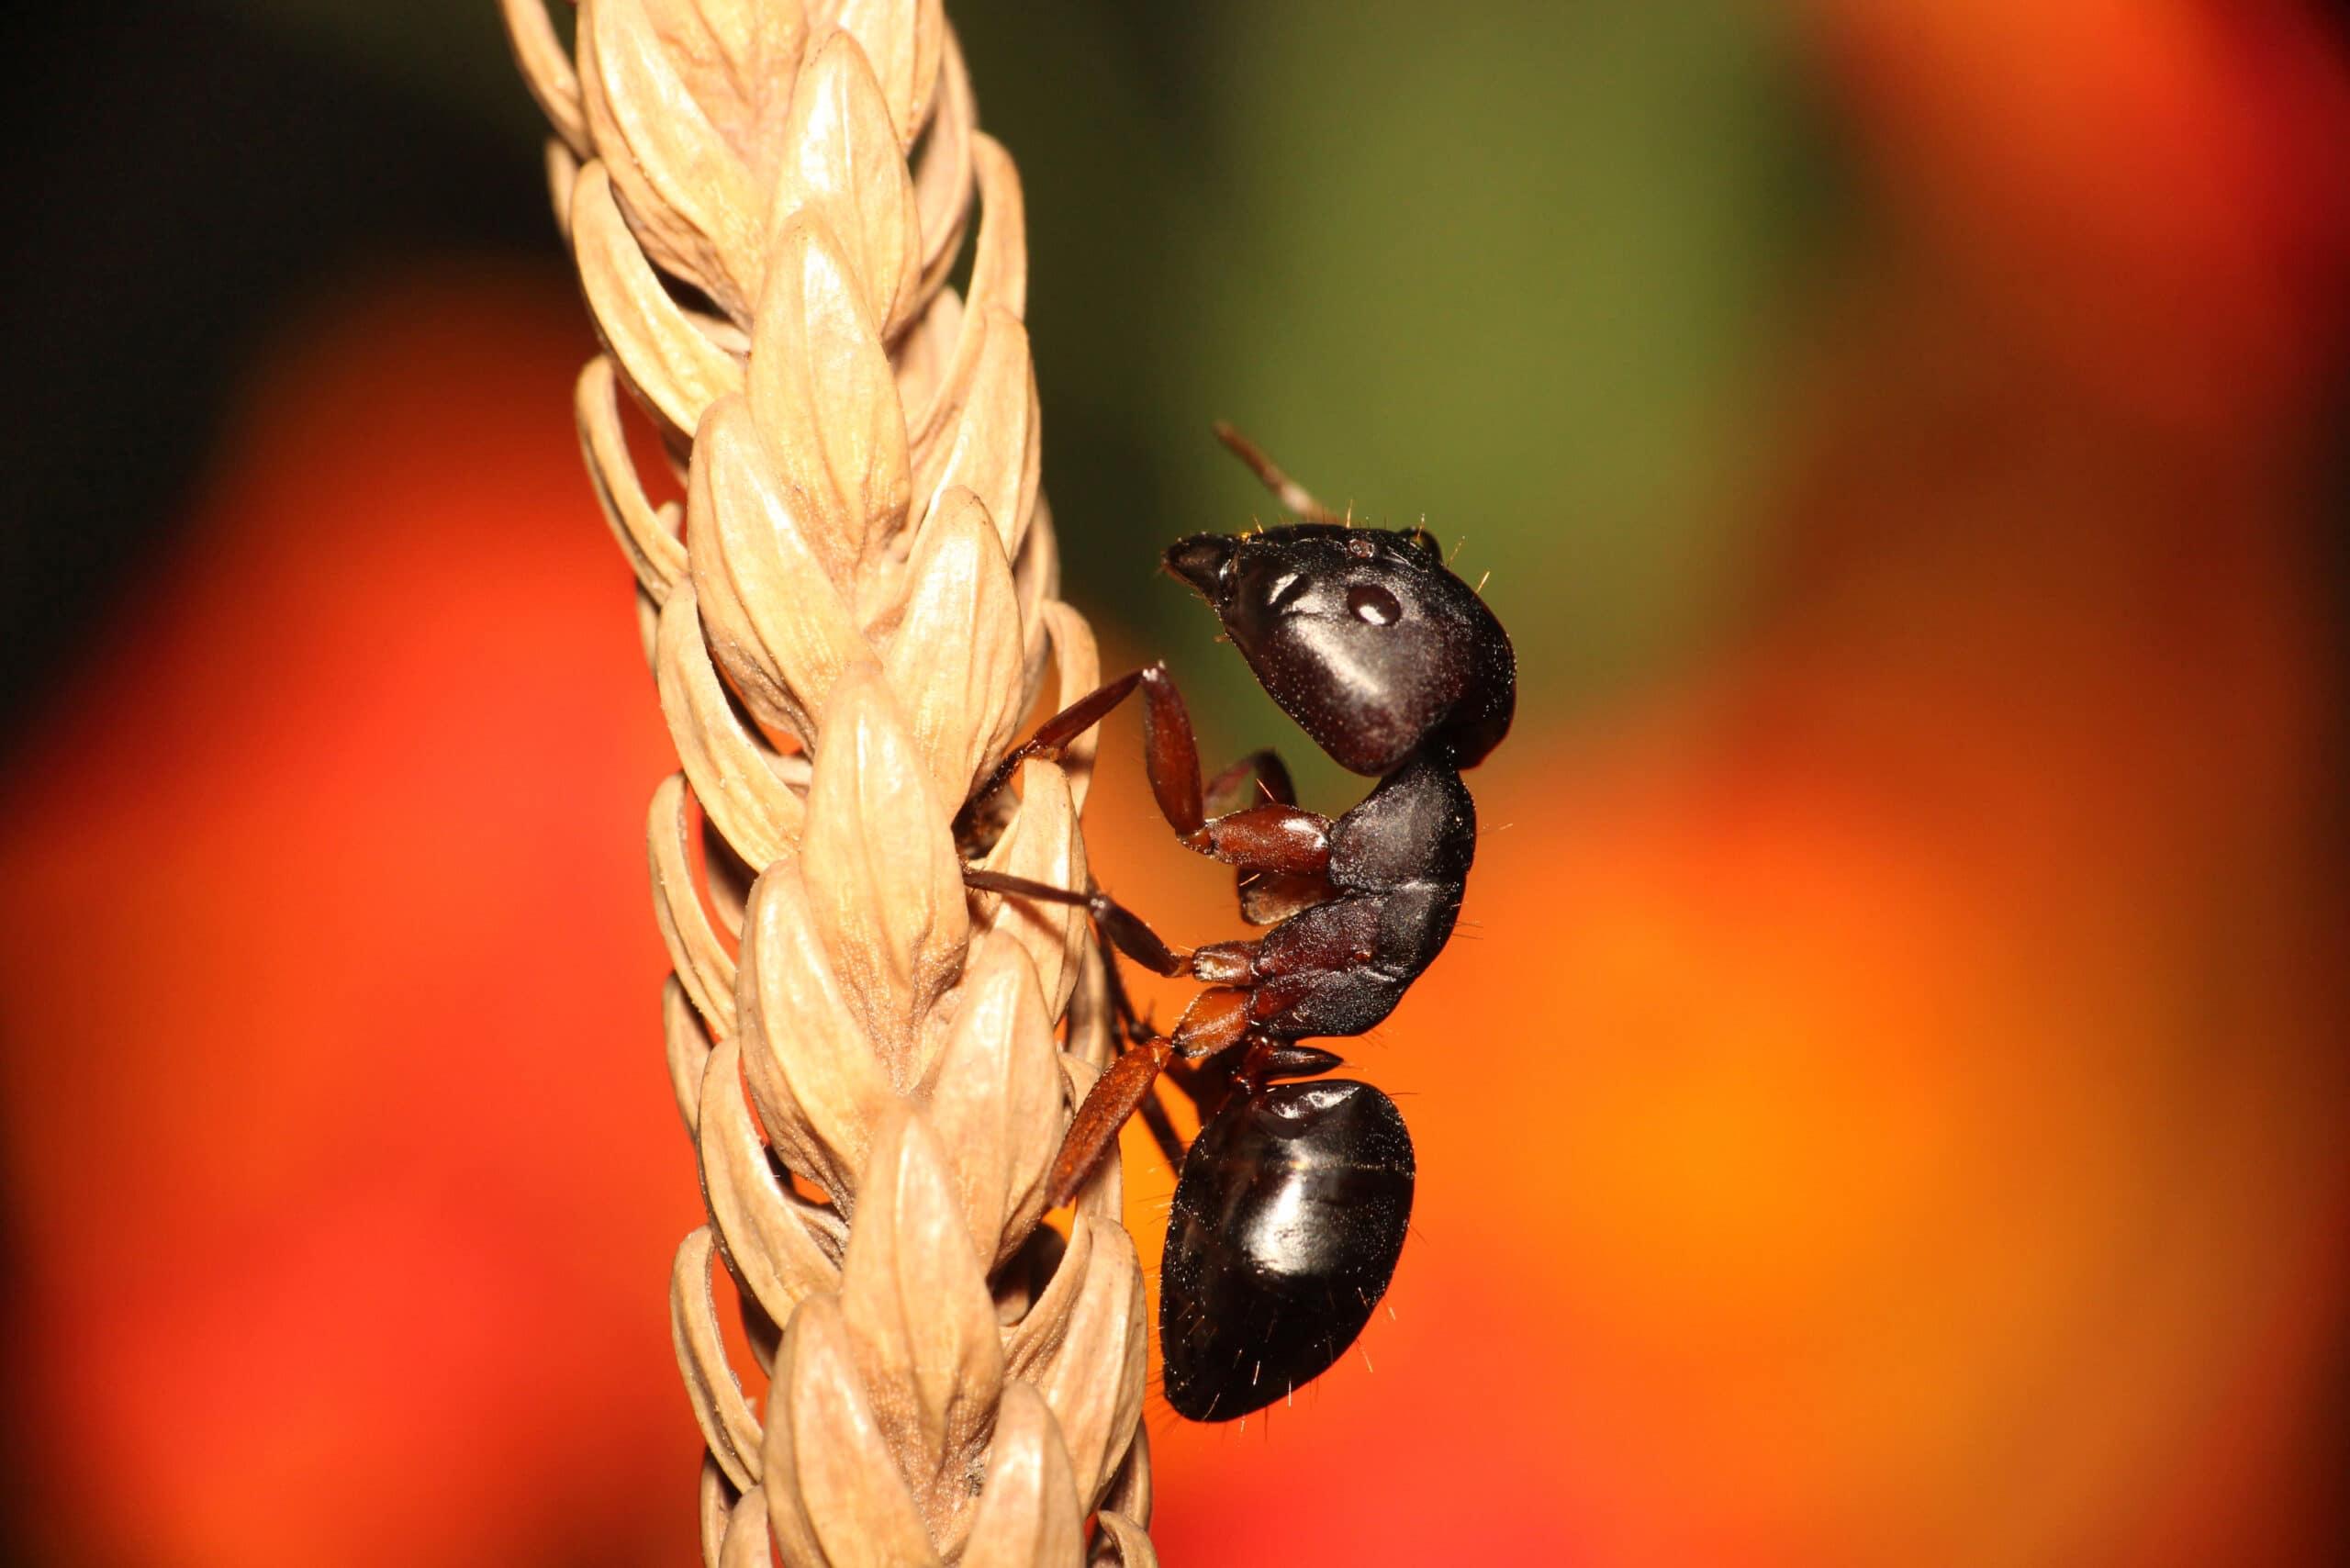 Carpenter ant pest control Toledo Bowling Green Sandusky